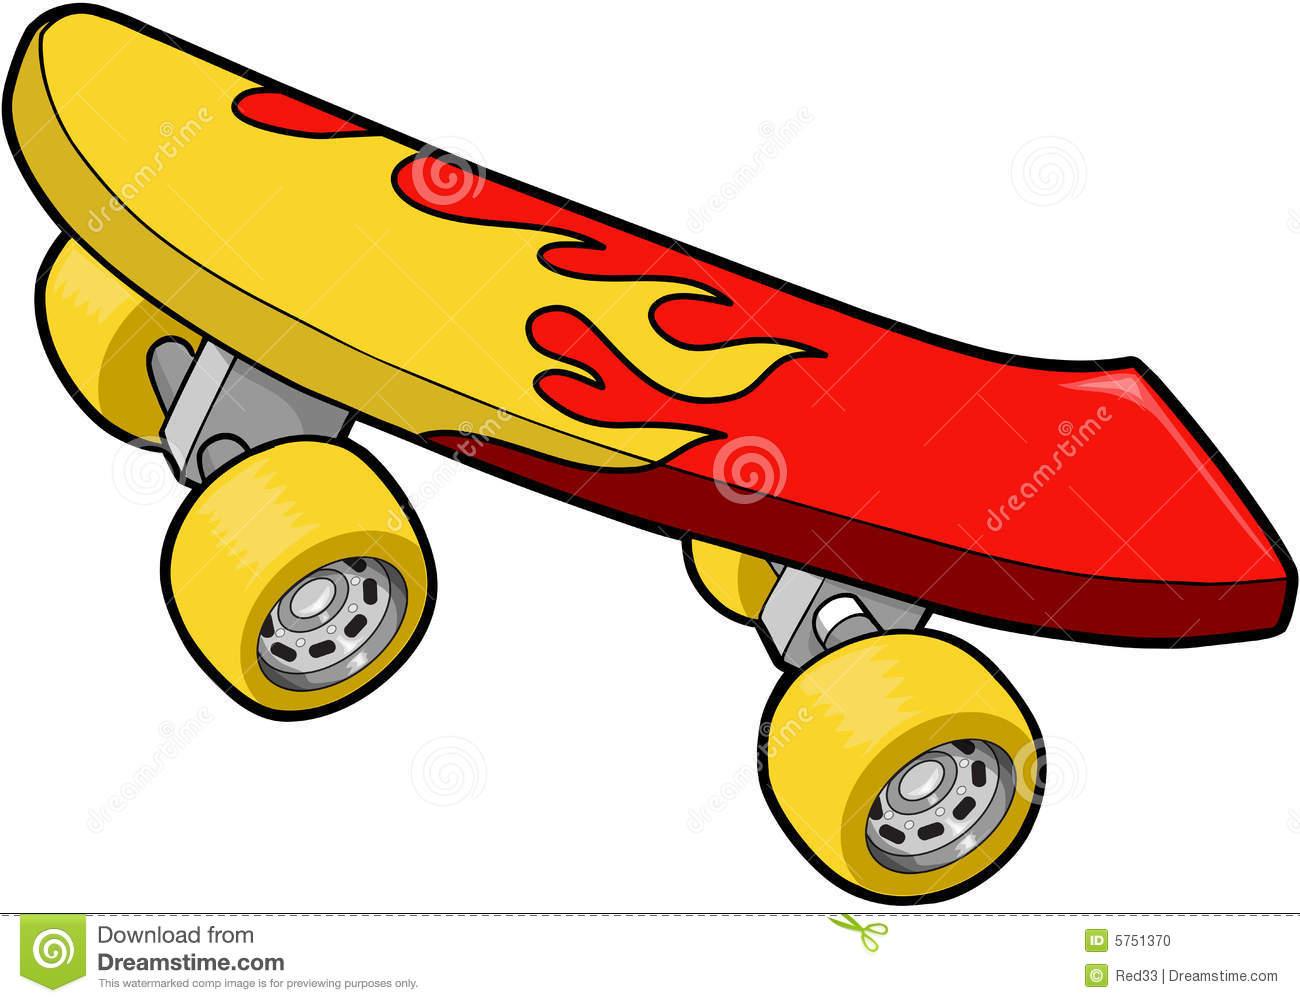 Skateboard clipart #3